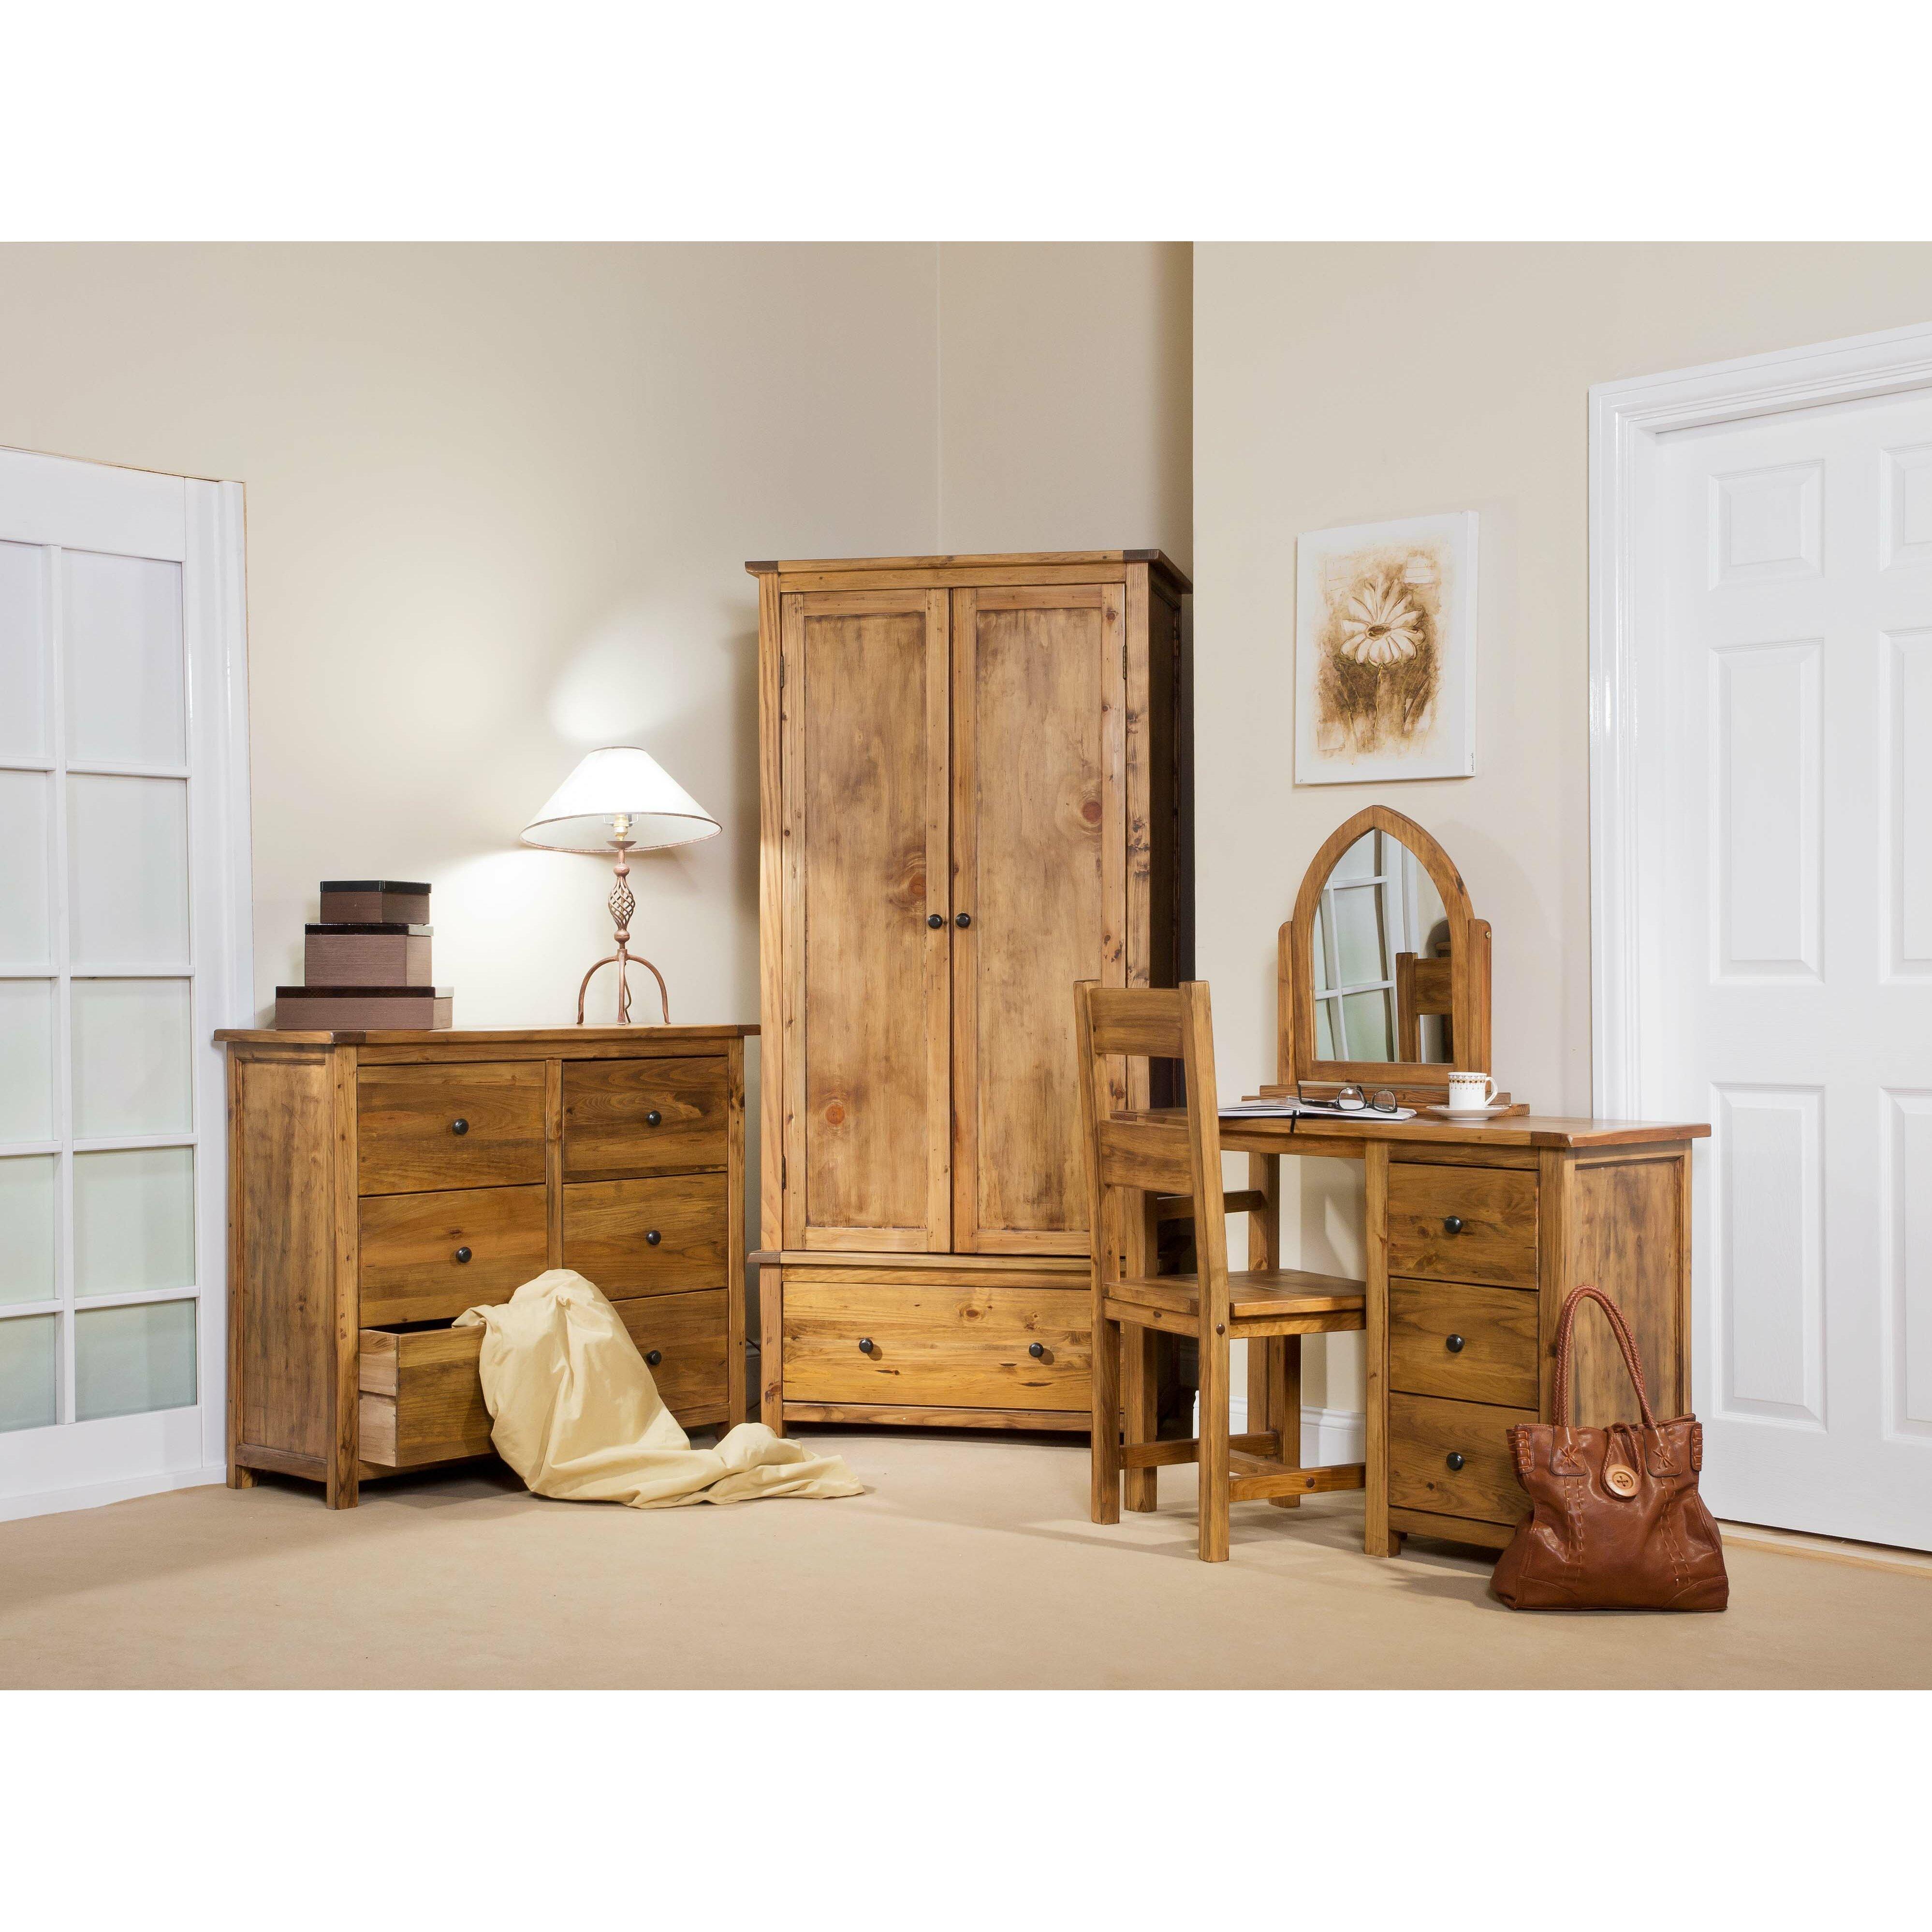 Home Haus Ukiah Arched Dressing Table Mirror Reviews Wayfair Uk